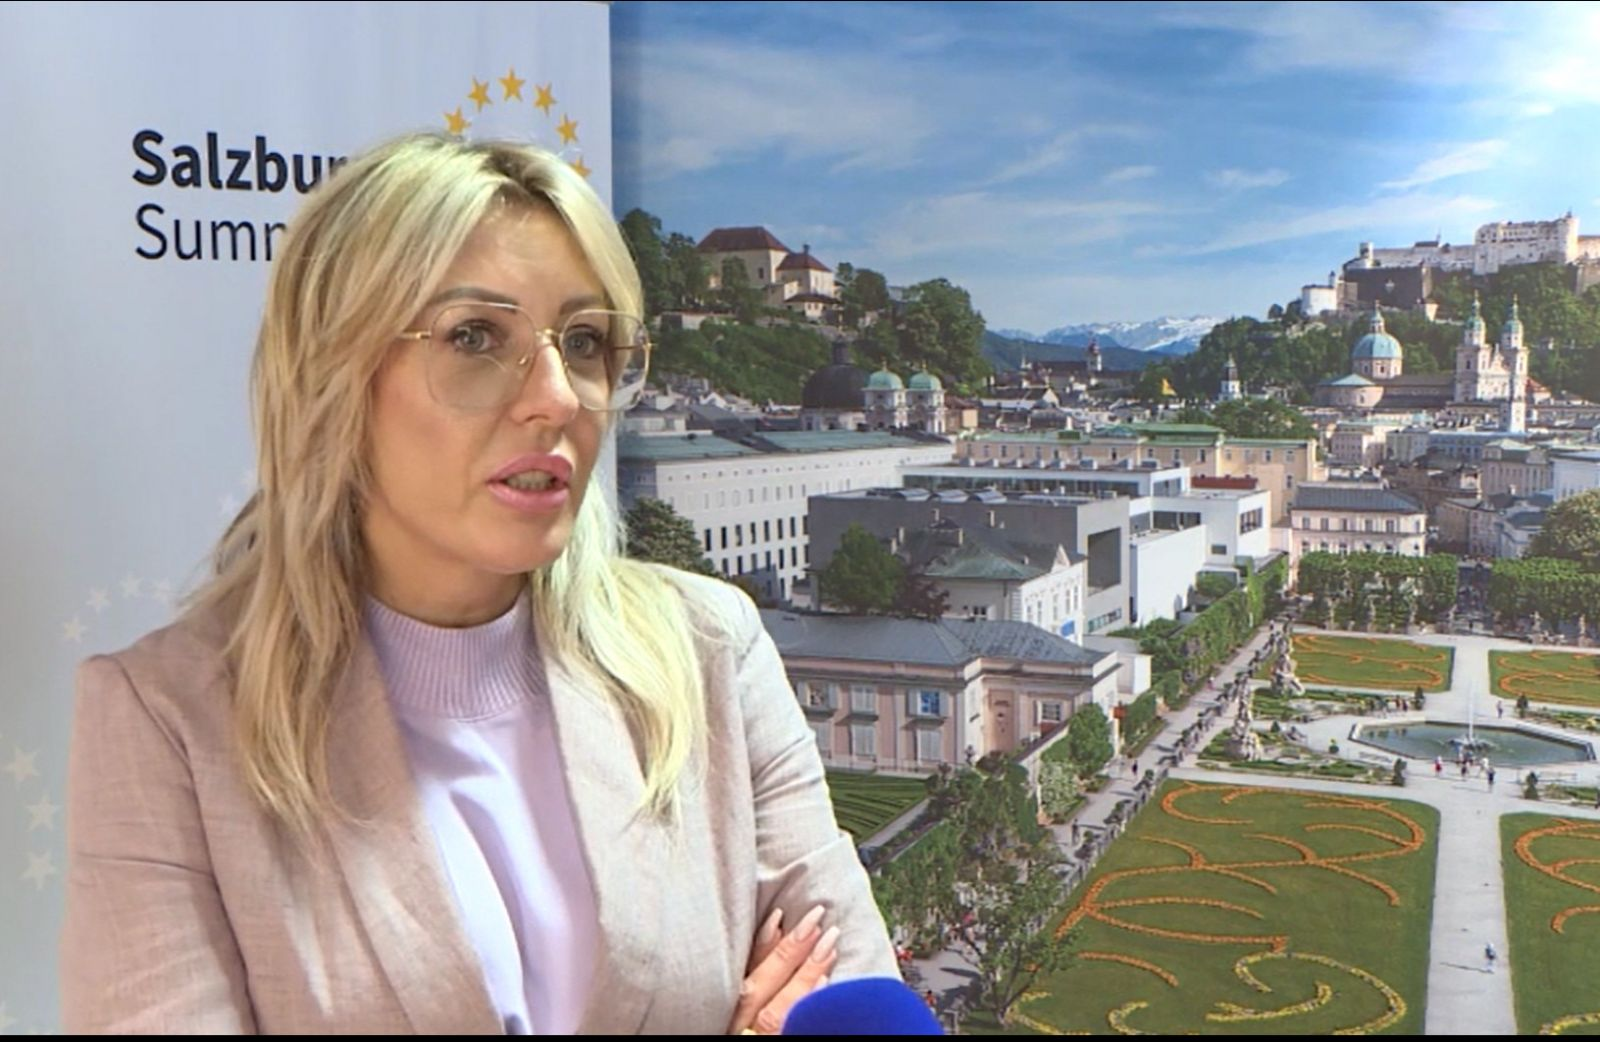 J. Joksimović: Most citizens support EU membership